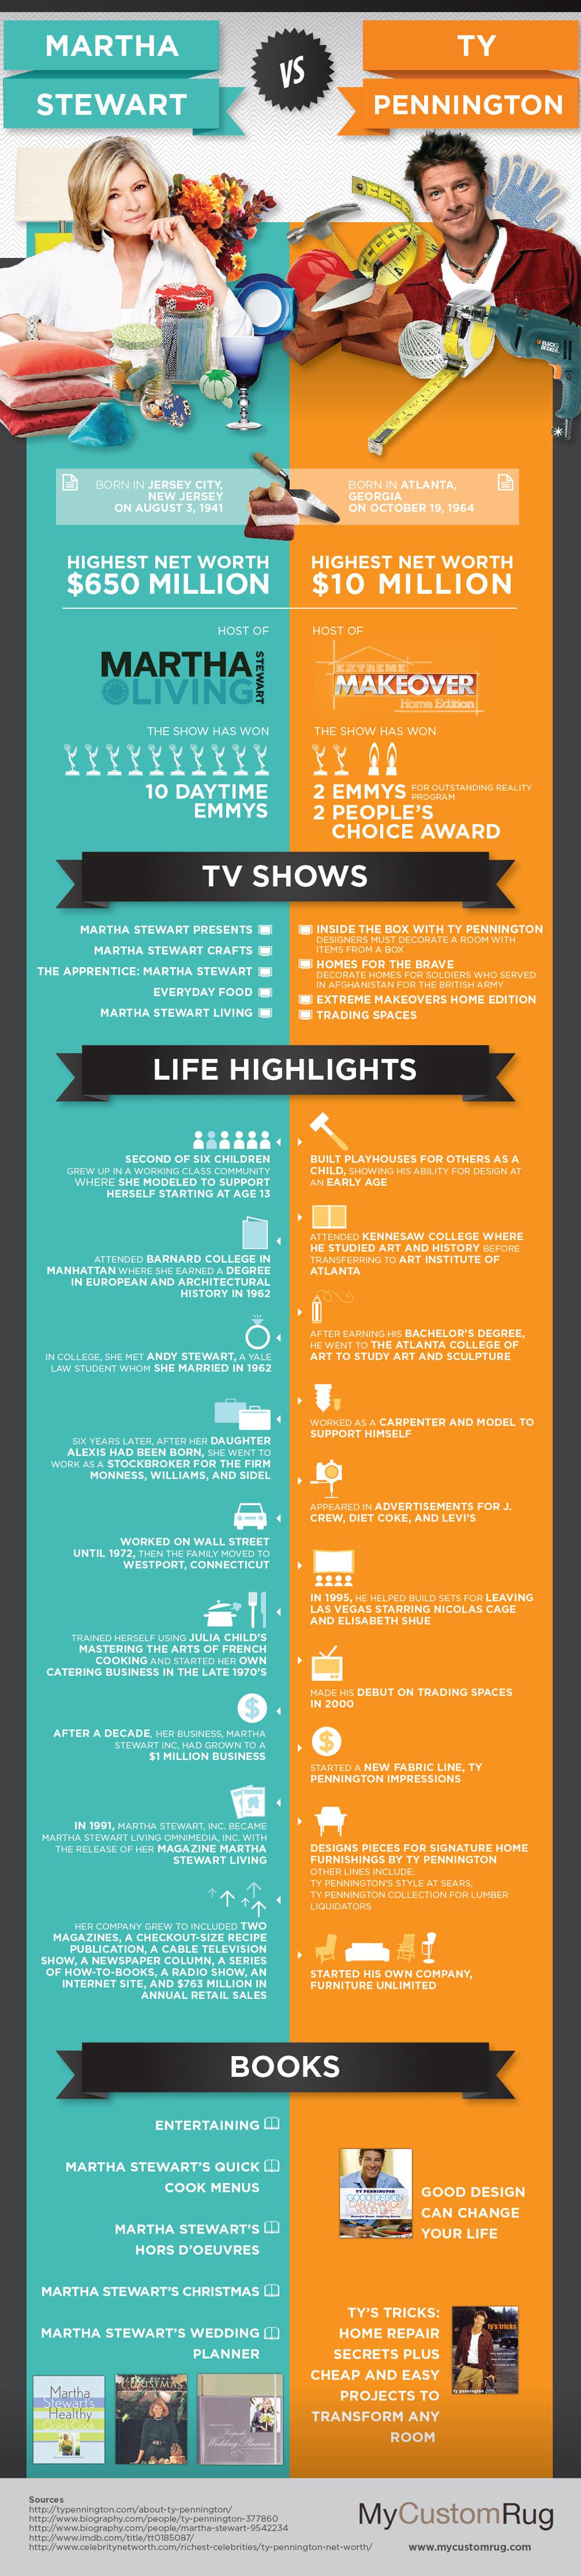 http://mycustomrug.com/infographics/martha-stewart-vs-ty-pennington